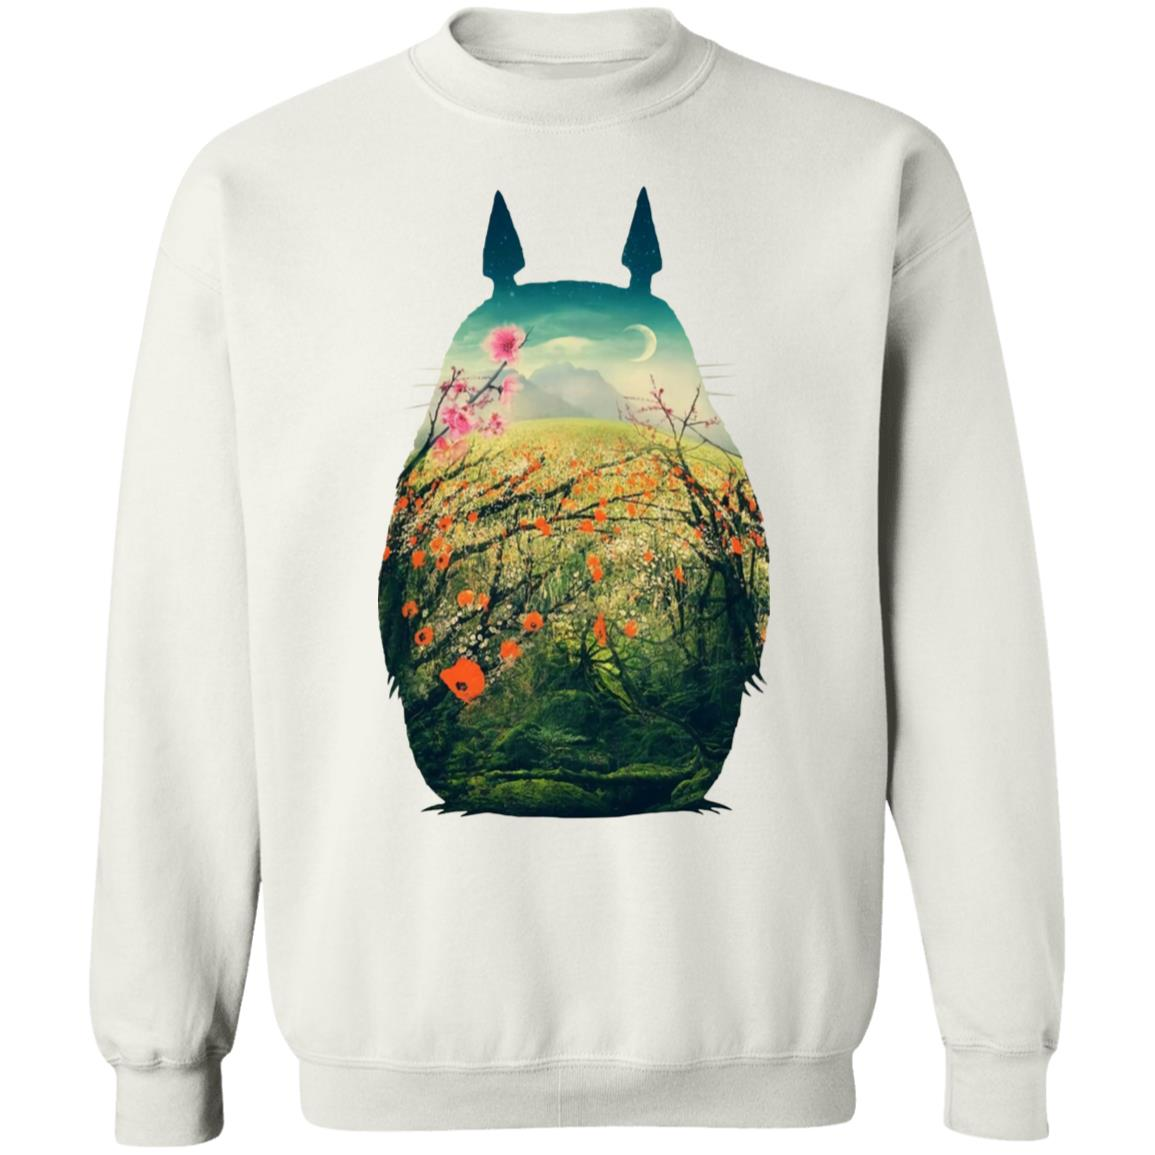 My Neighbor Totoro Colorful Cutout Sweatshirt